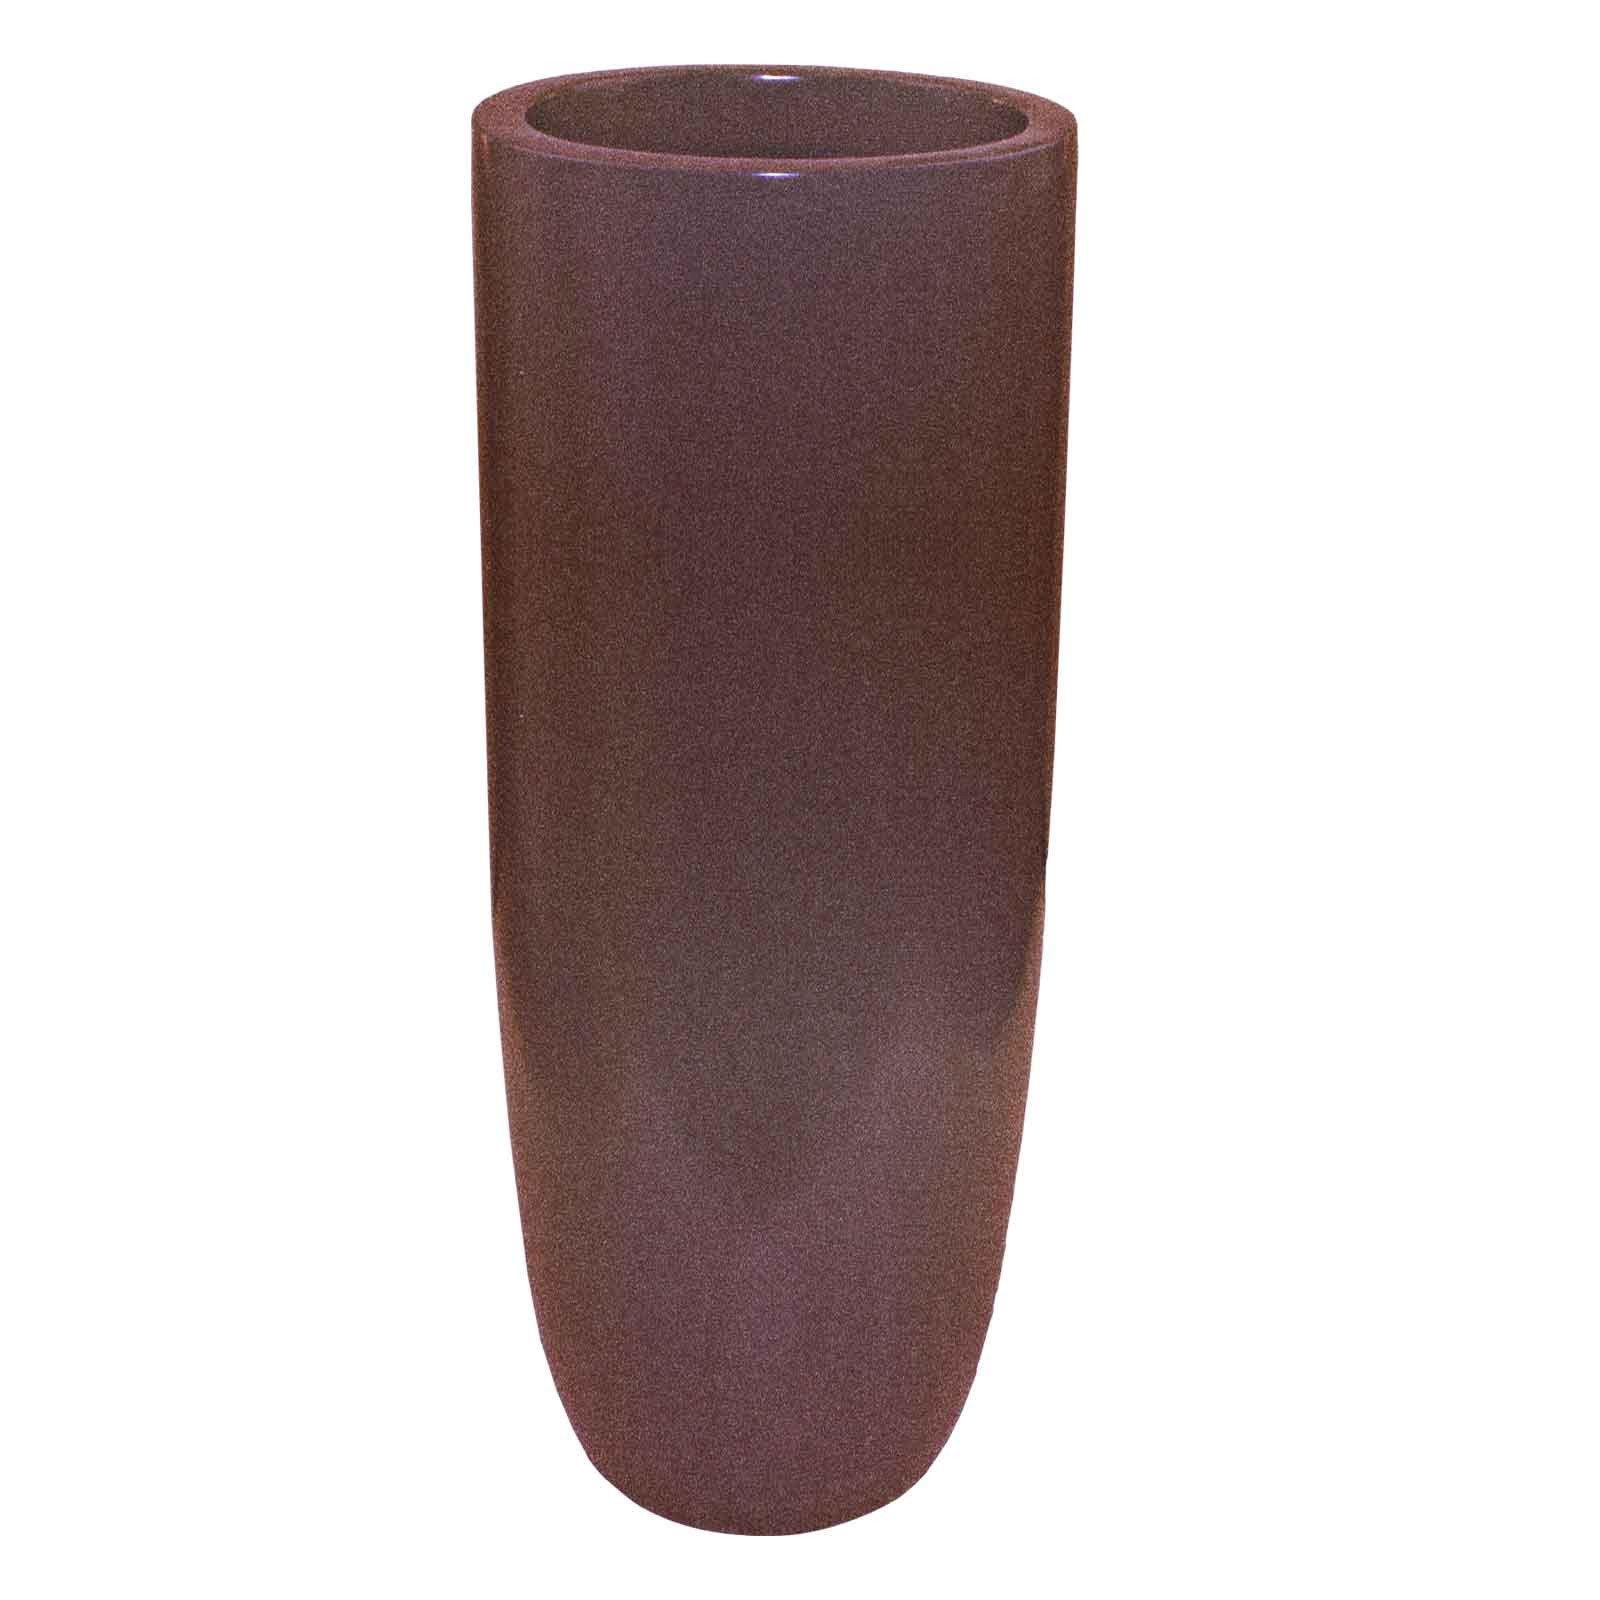 Saint Tropez Indoor & Outdoor Tapered Vase Planter - 12'x12'x32' / Lemon - Glossy Finish - Round Planter Pots - Jay Scotts Collection - Pots Planters & More - 1  Saint Tropez Indoor & Outdoor Tapered Vase Planter - 12'x12'x32' / Ebony - Matte Finish